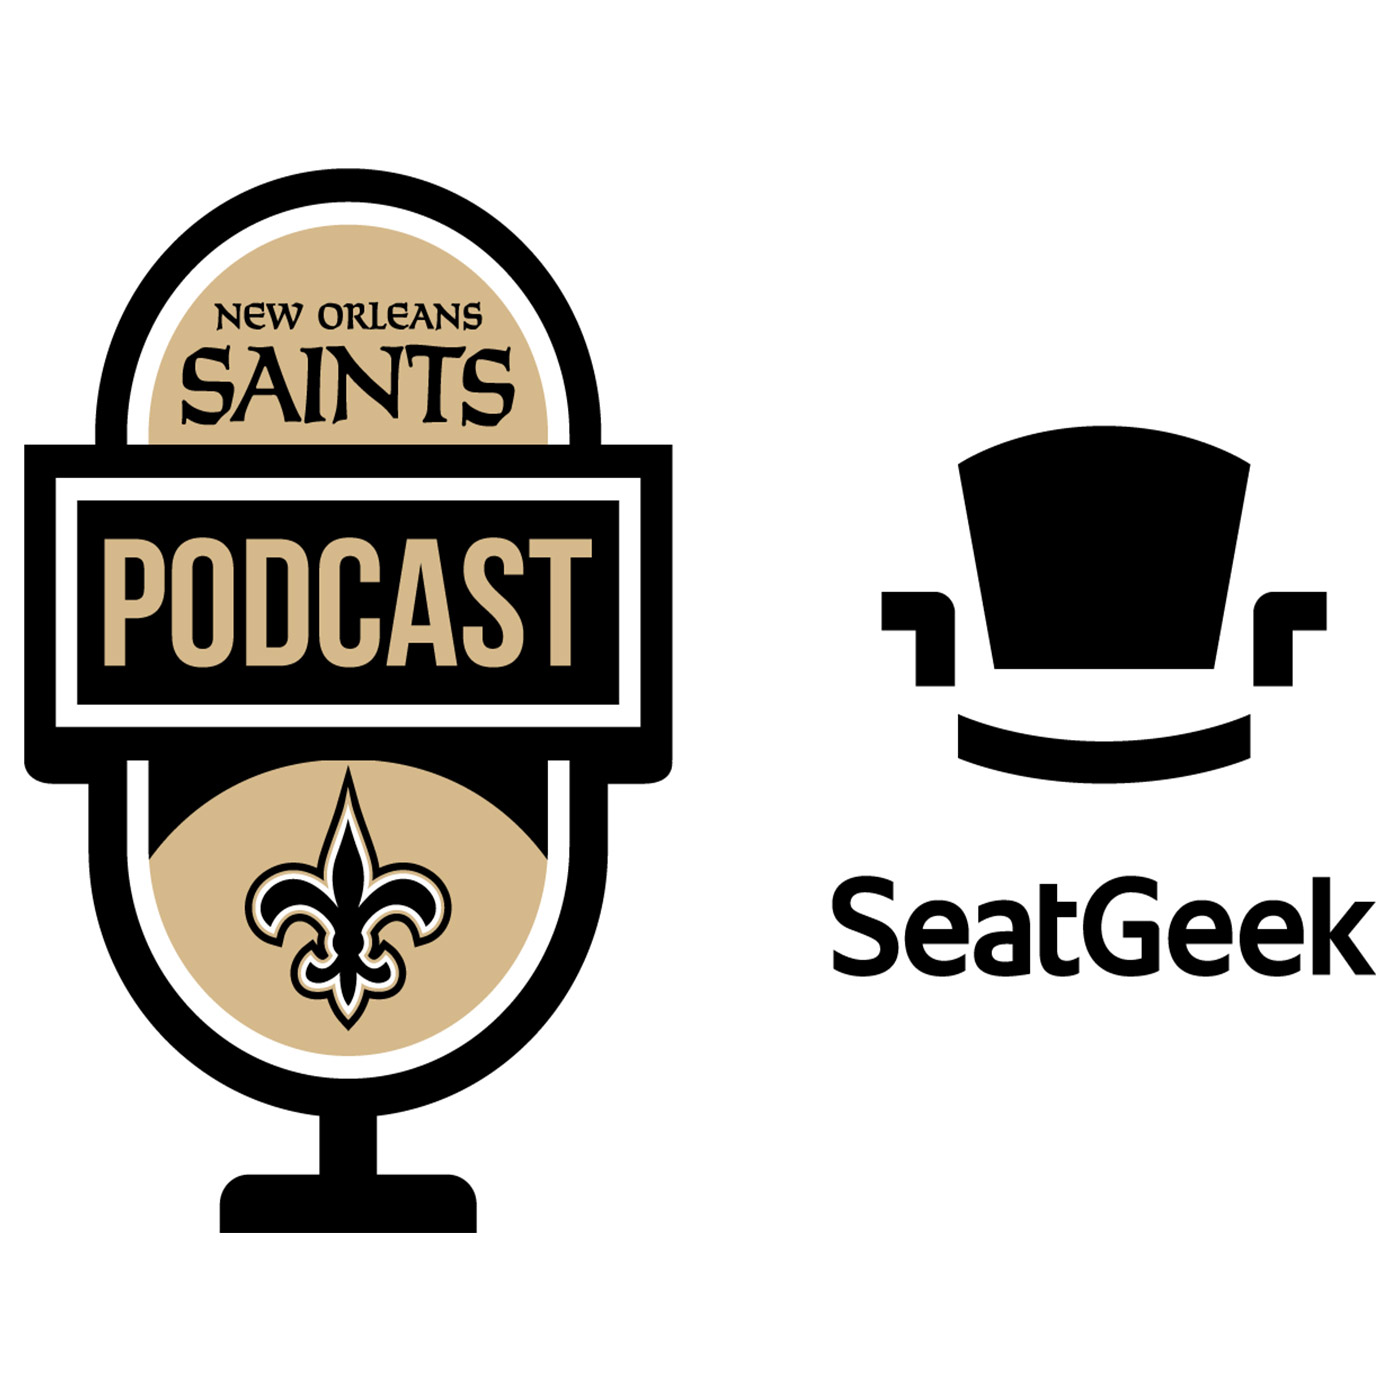 New Orleans Saints Podcast